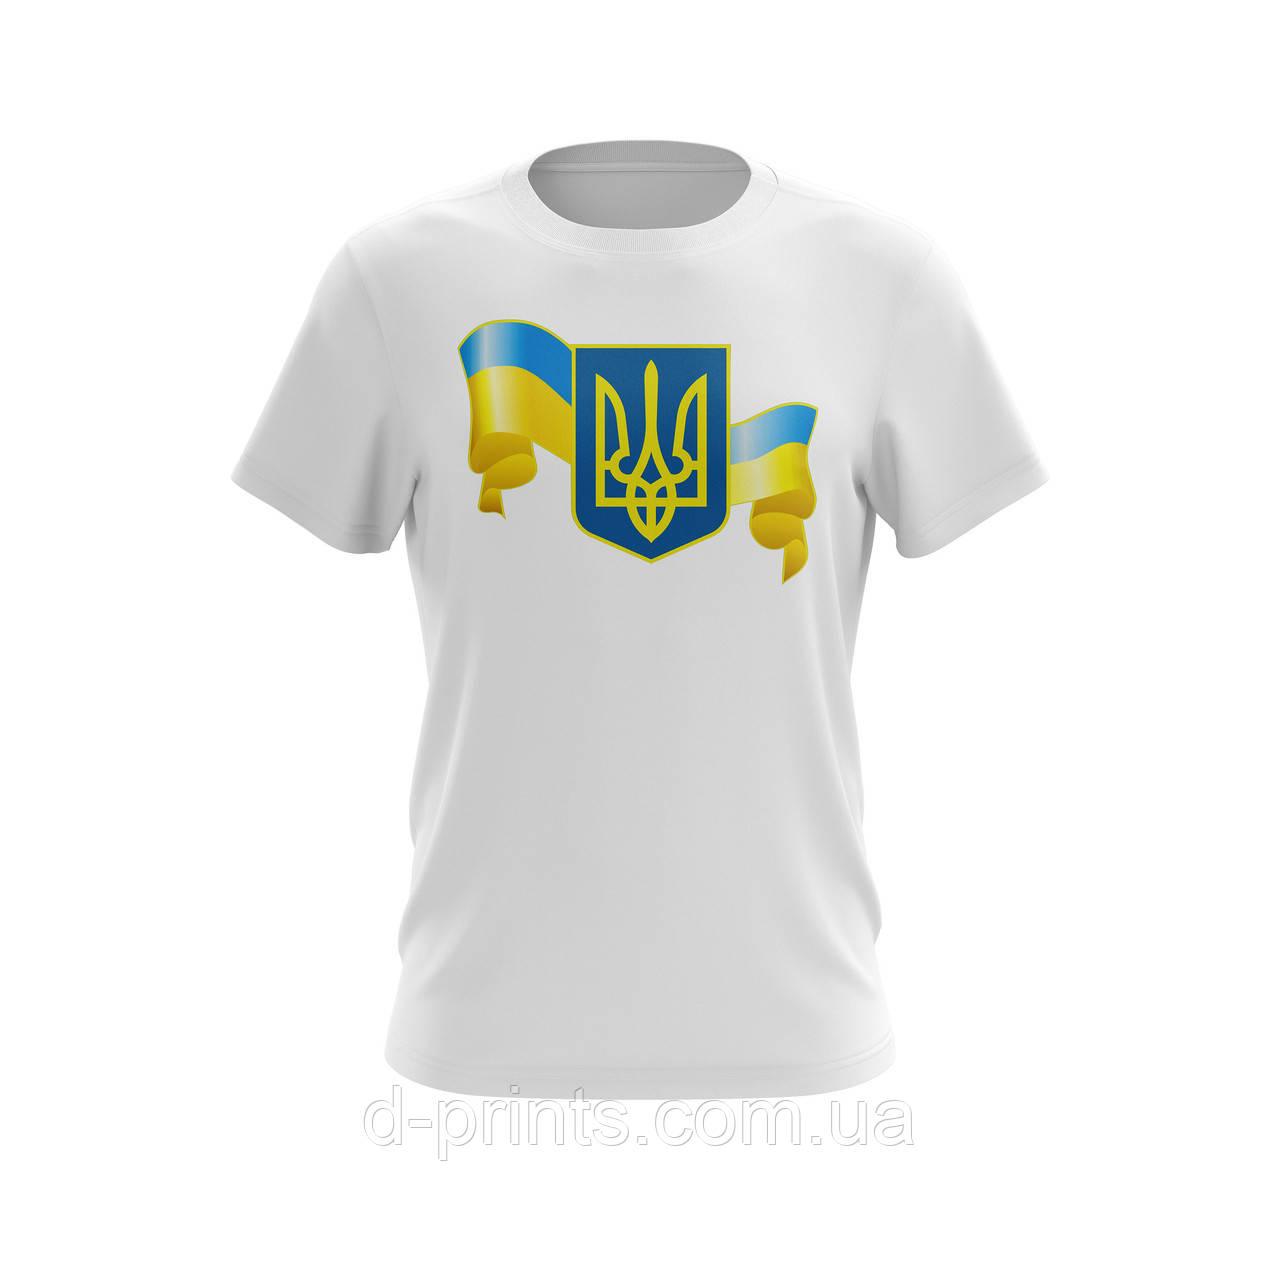 "Футболка мужская с рисунком ""Украина"" MF-12-07"